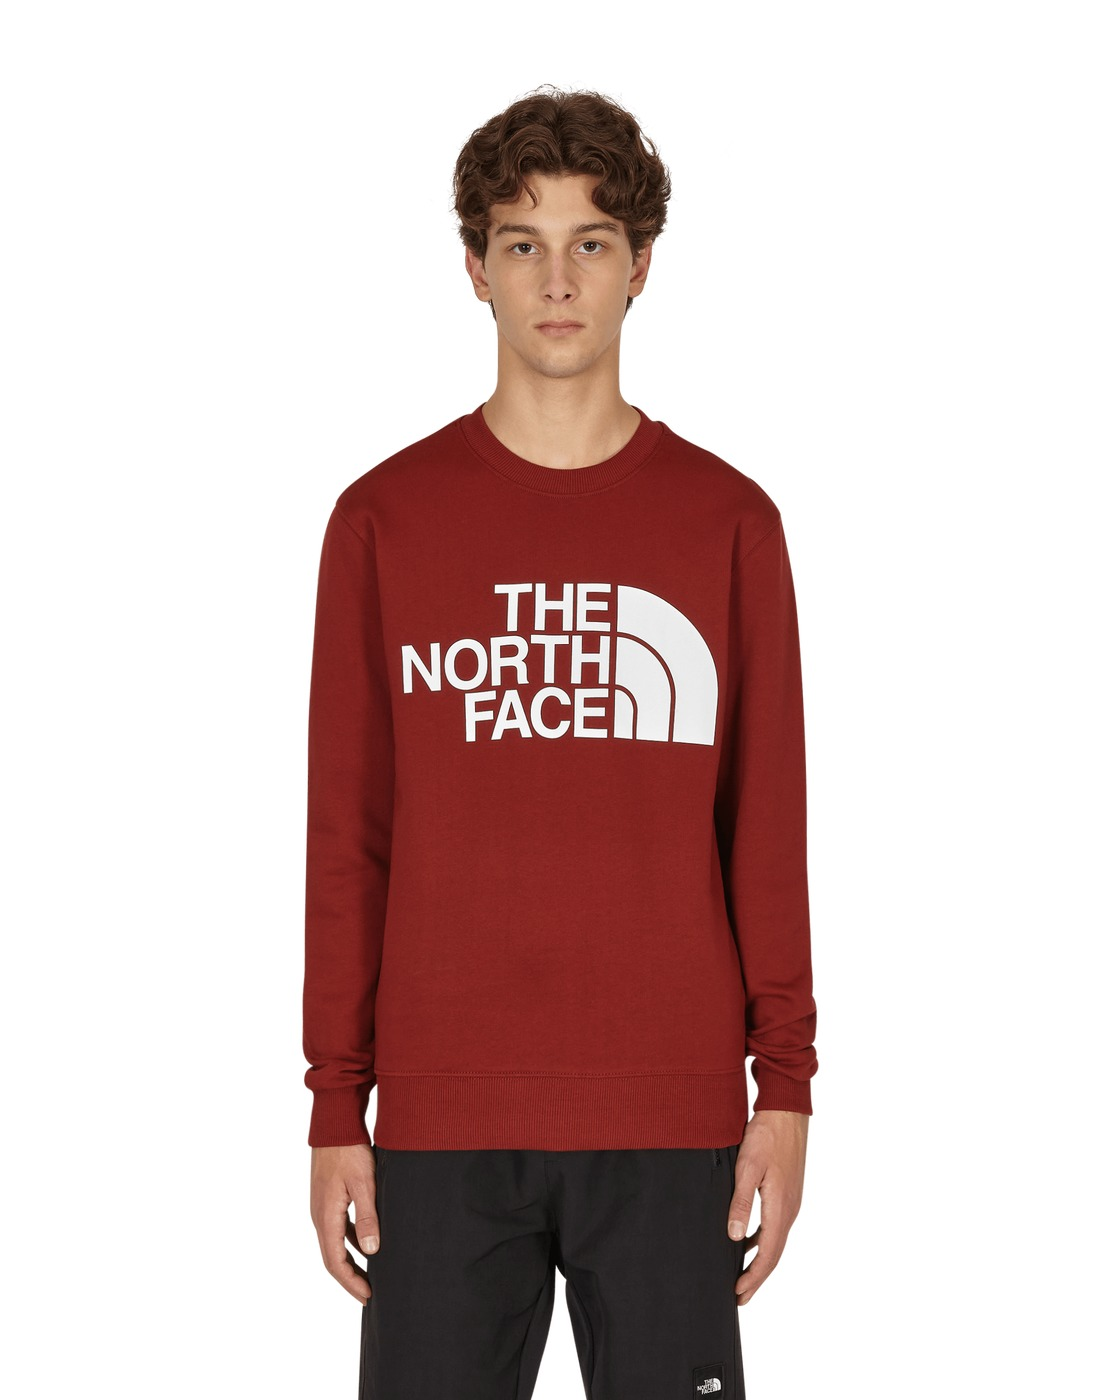 Photo: The North Face Standard Crewneck Sweatshirt Brick House Red